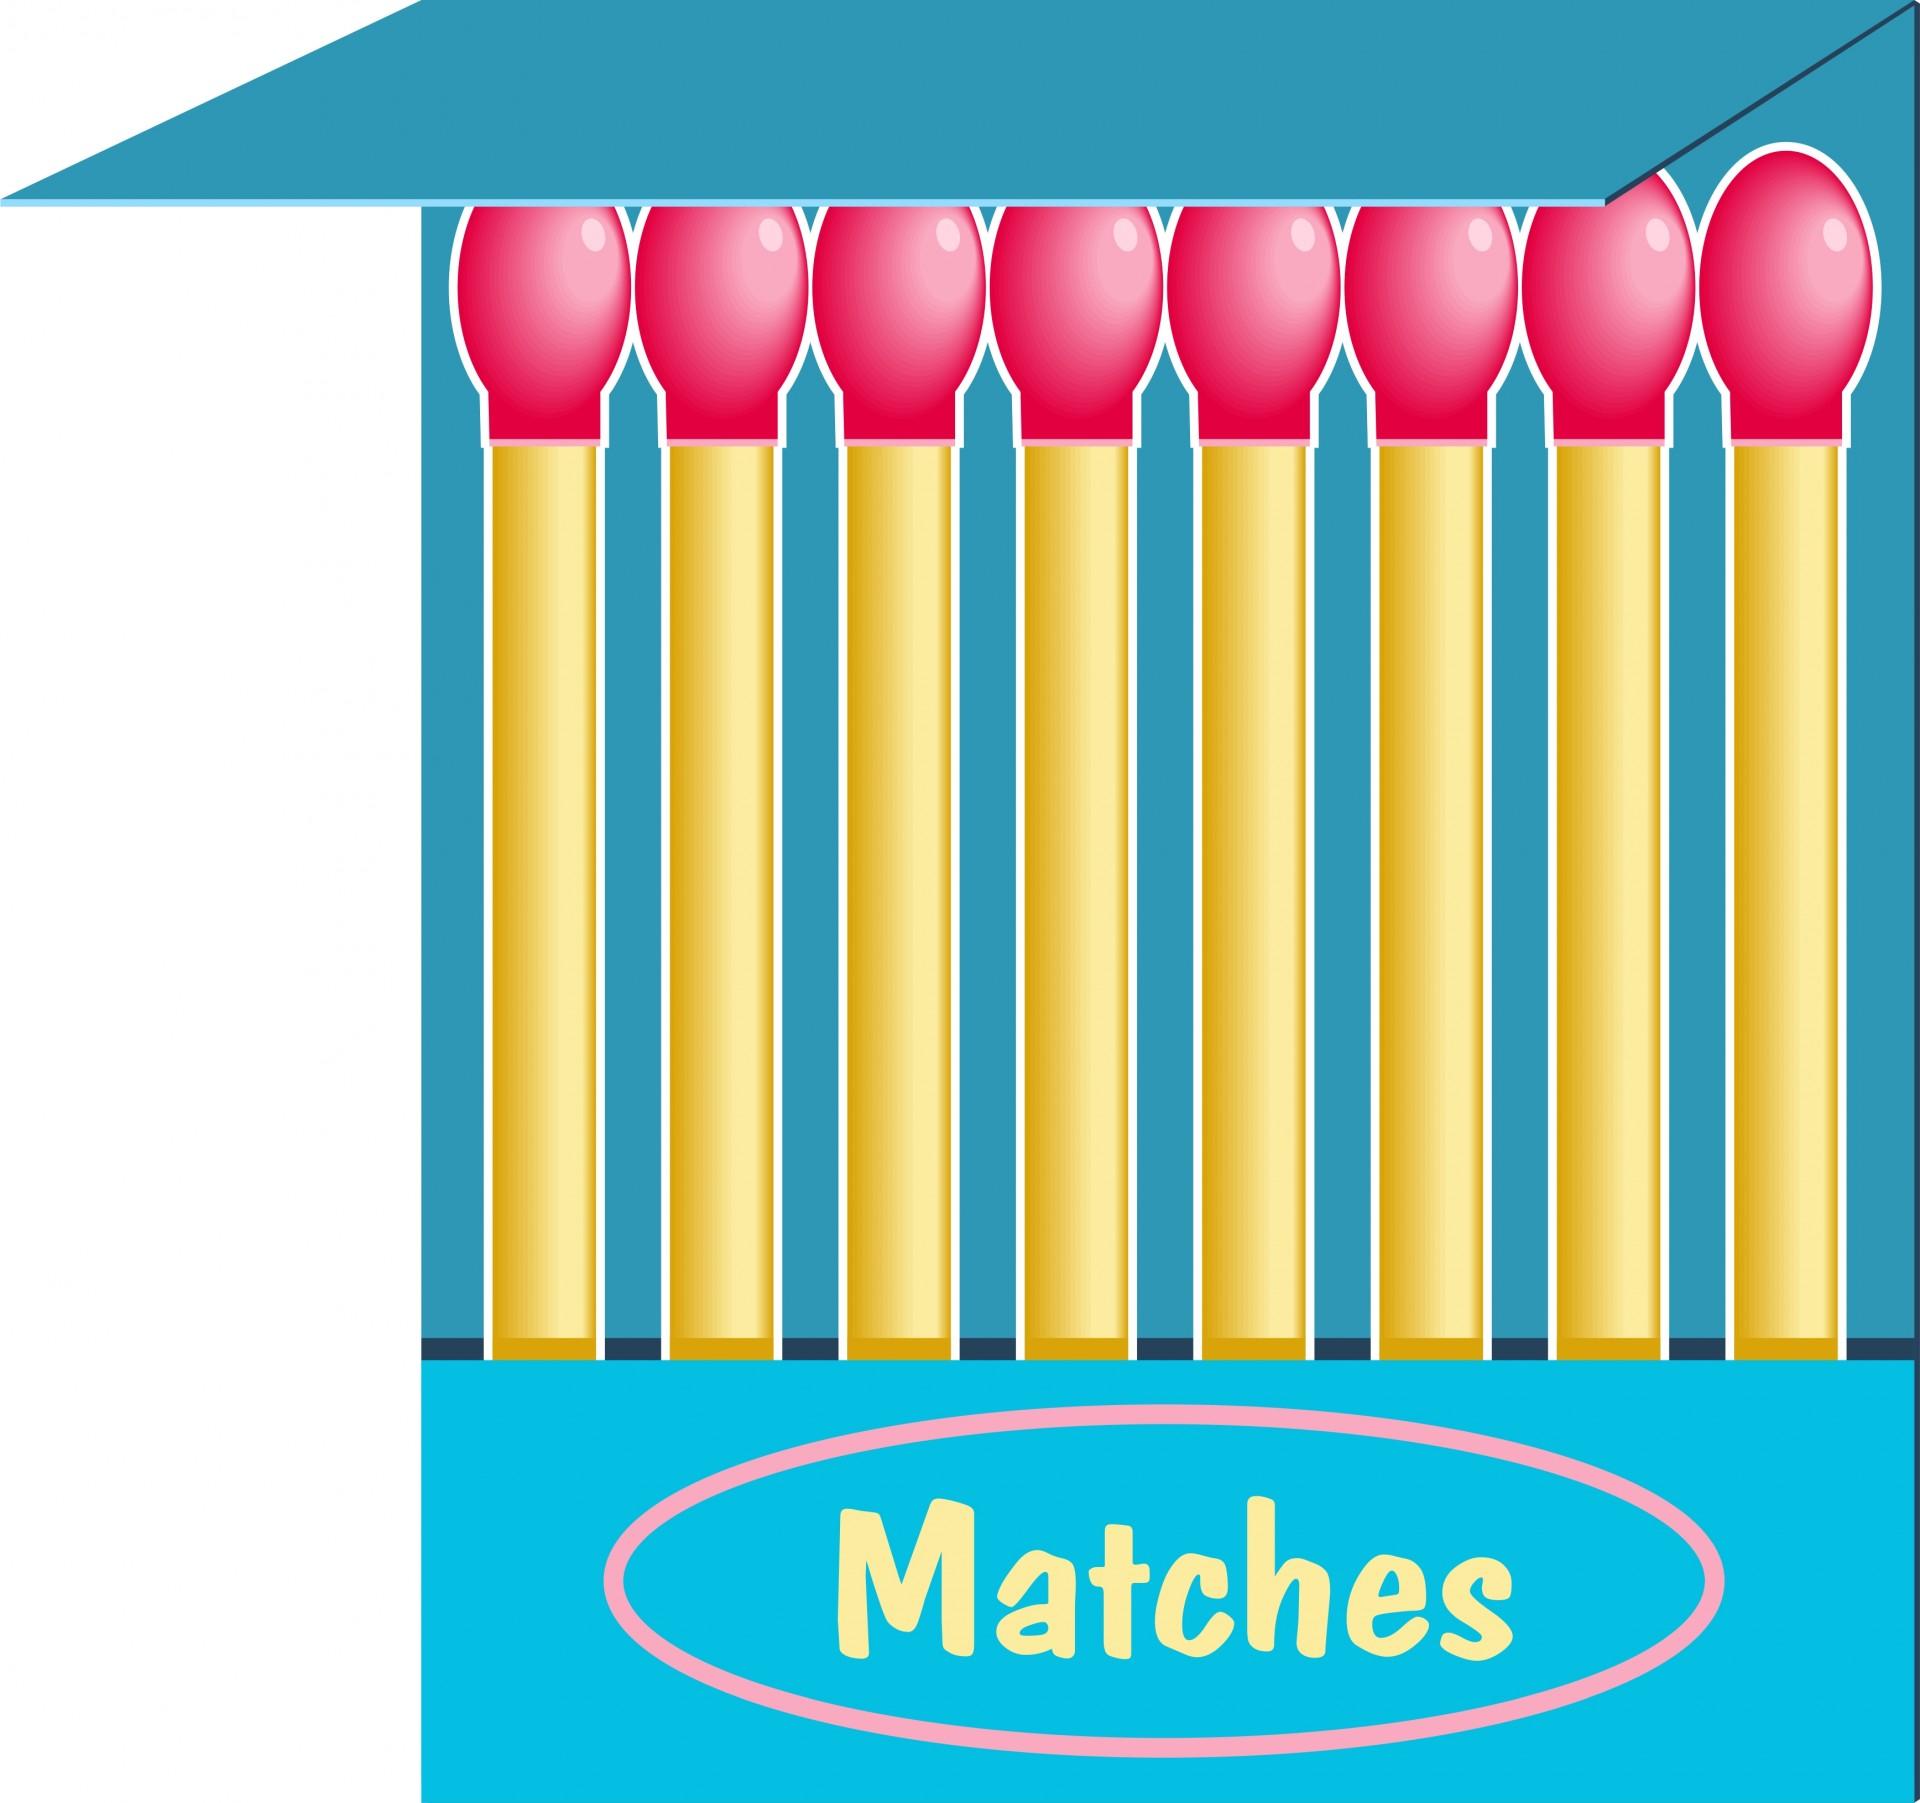 Matches Clip Art Free Stock Photo.